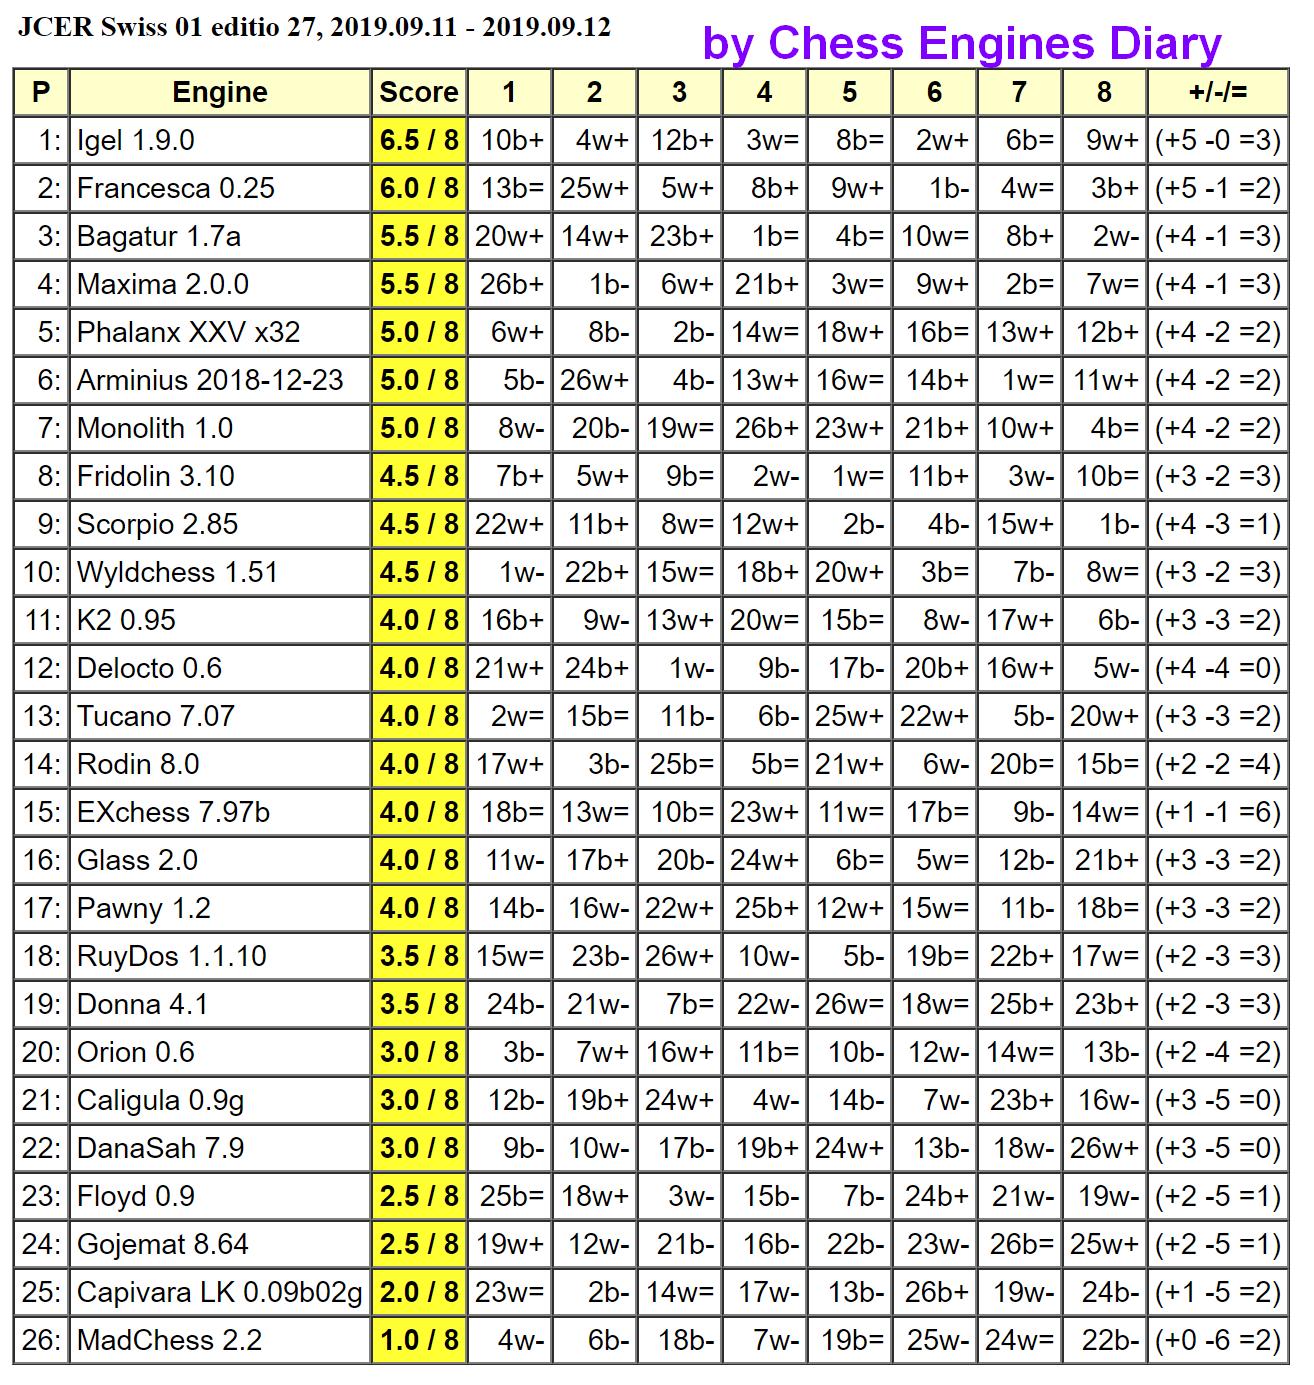 JCER Tournament 2019 - Page 6 2019.09.11.Swiss01.ed27.html